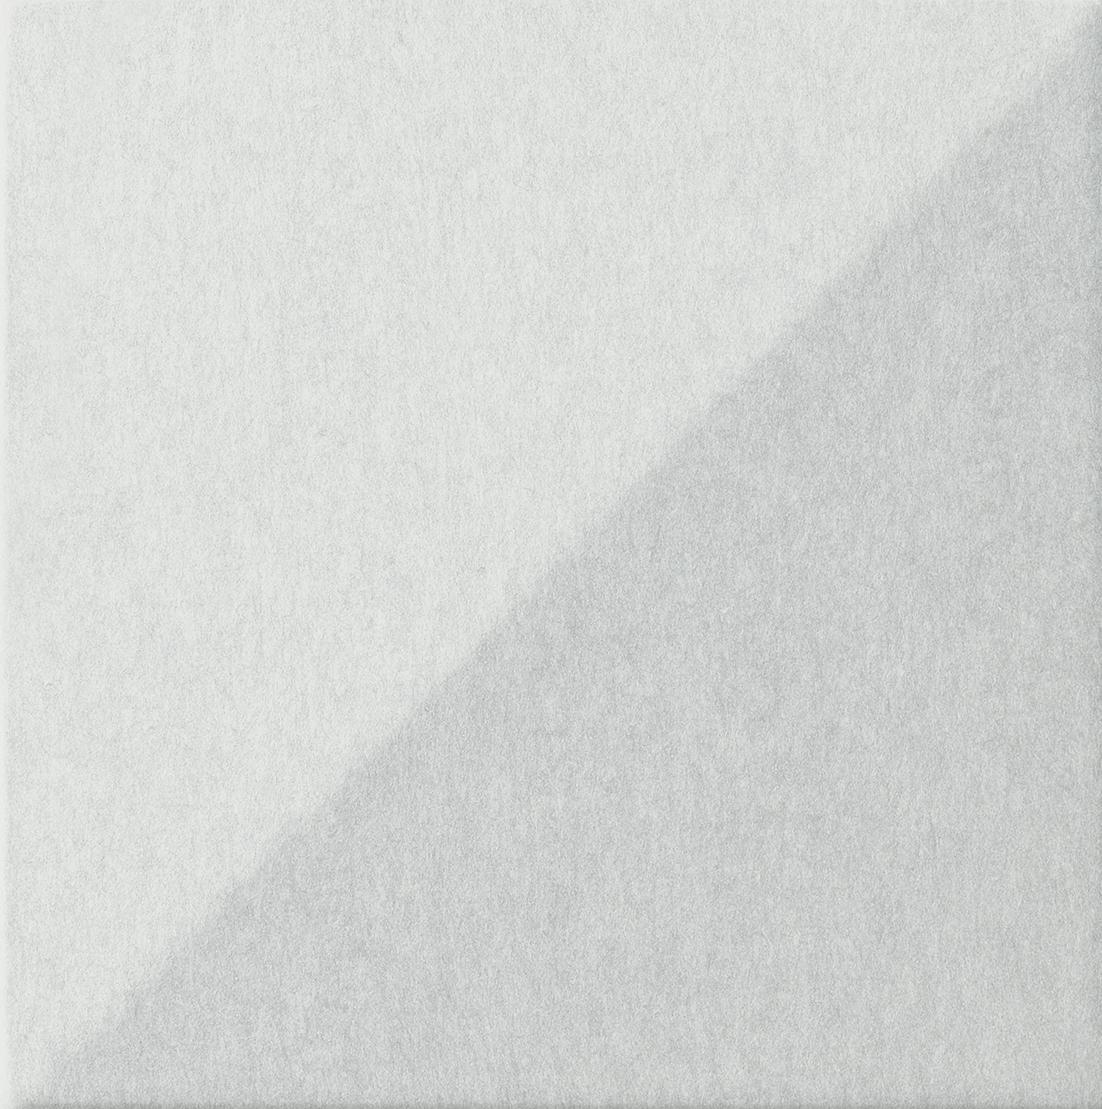 SOUNDWAVE BELLA OFF-WHITE